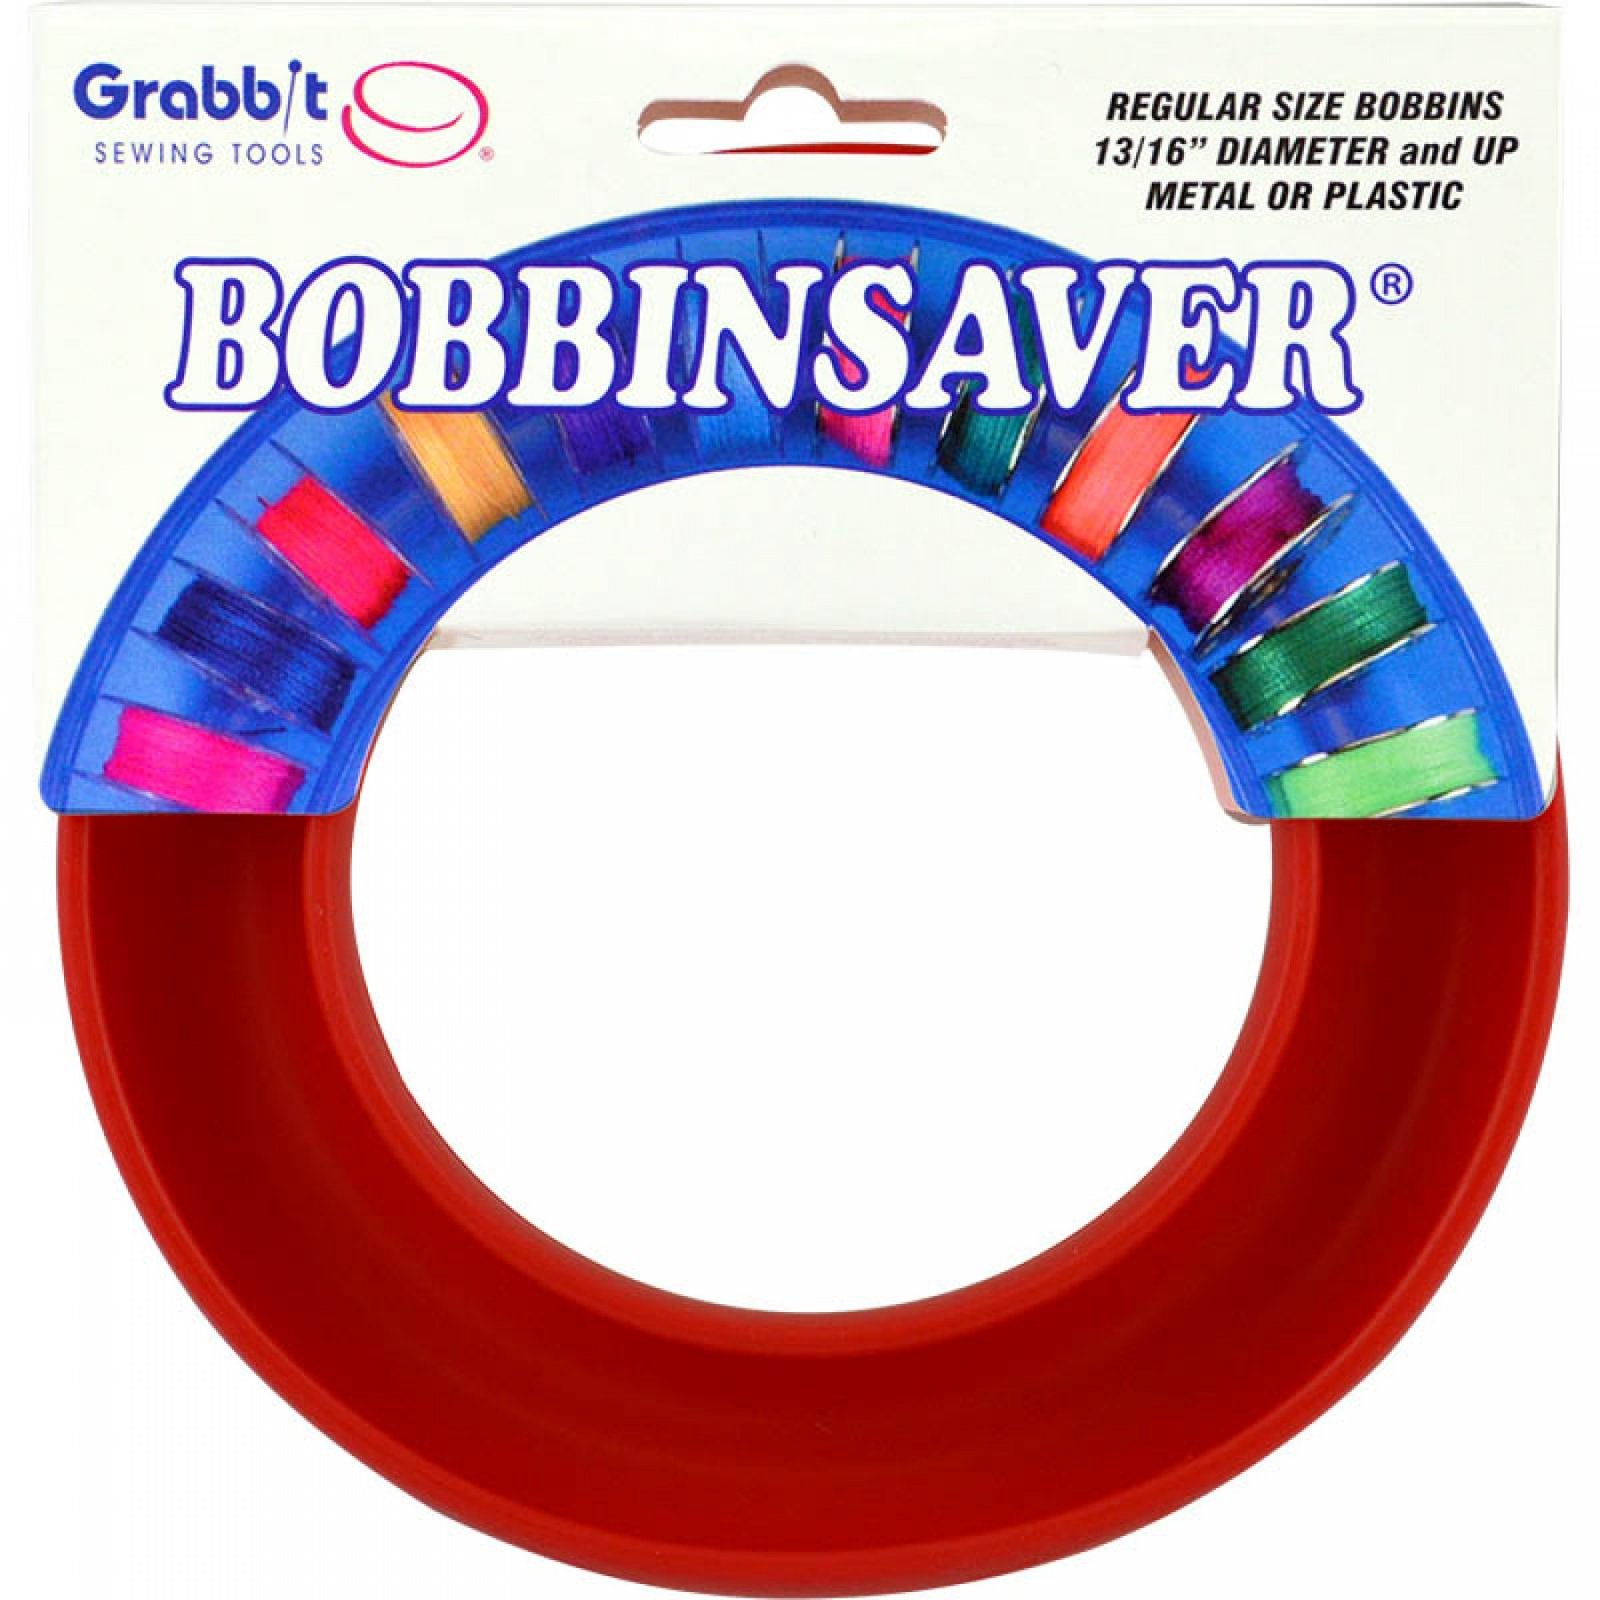 Red BobbinSaver Bobbin Holder